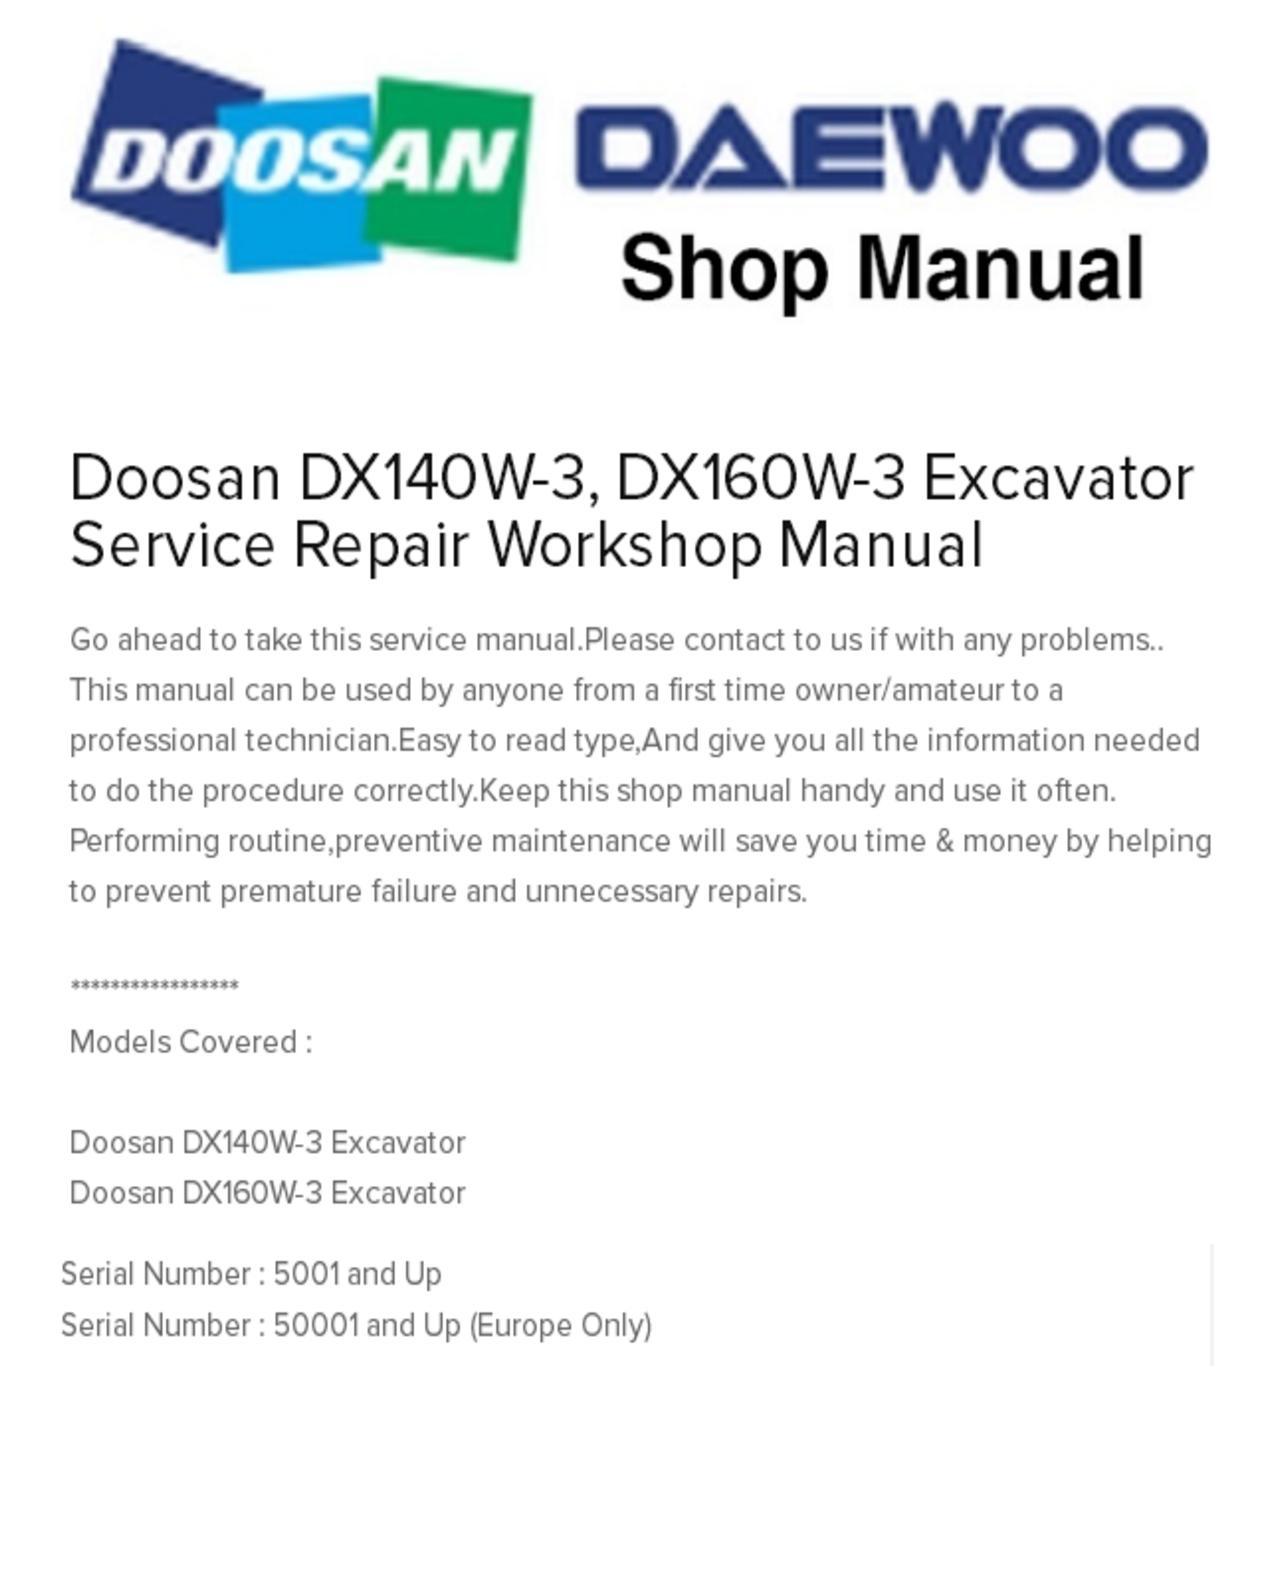 Calaméo - Doosan DX140W-3, DX160W-3 Excavator Service Repair Workshop Manual